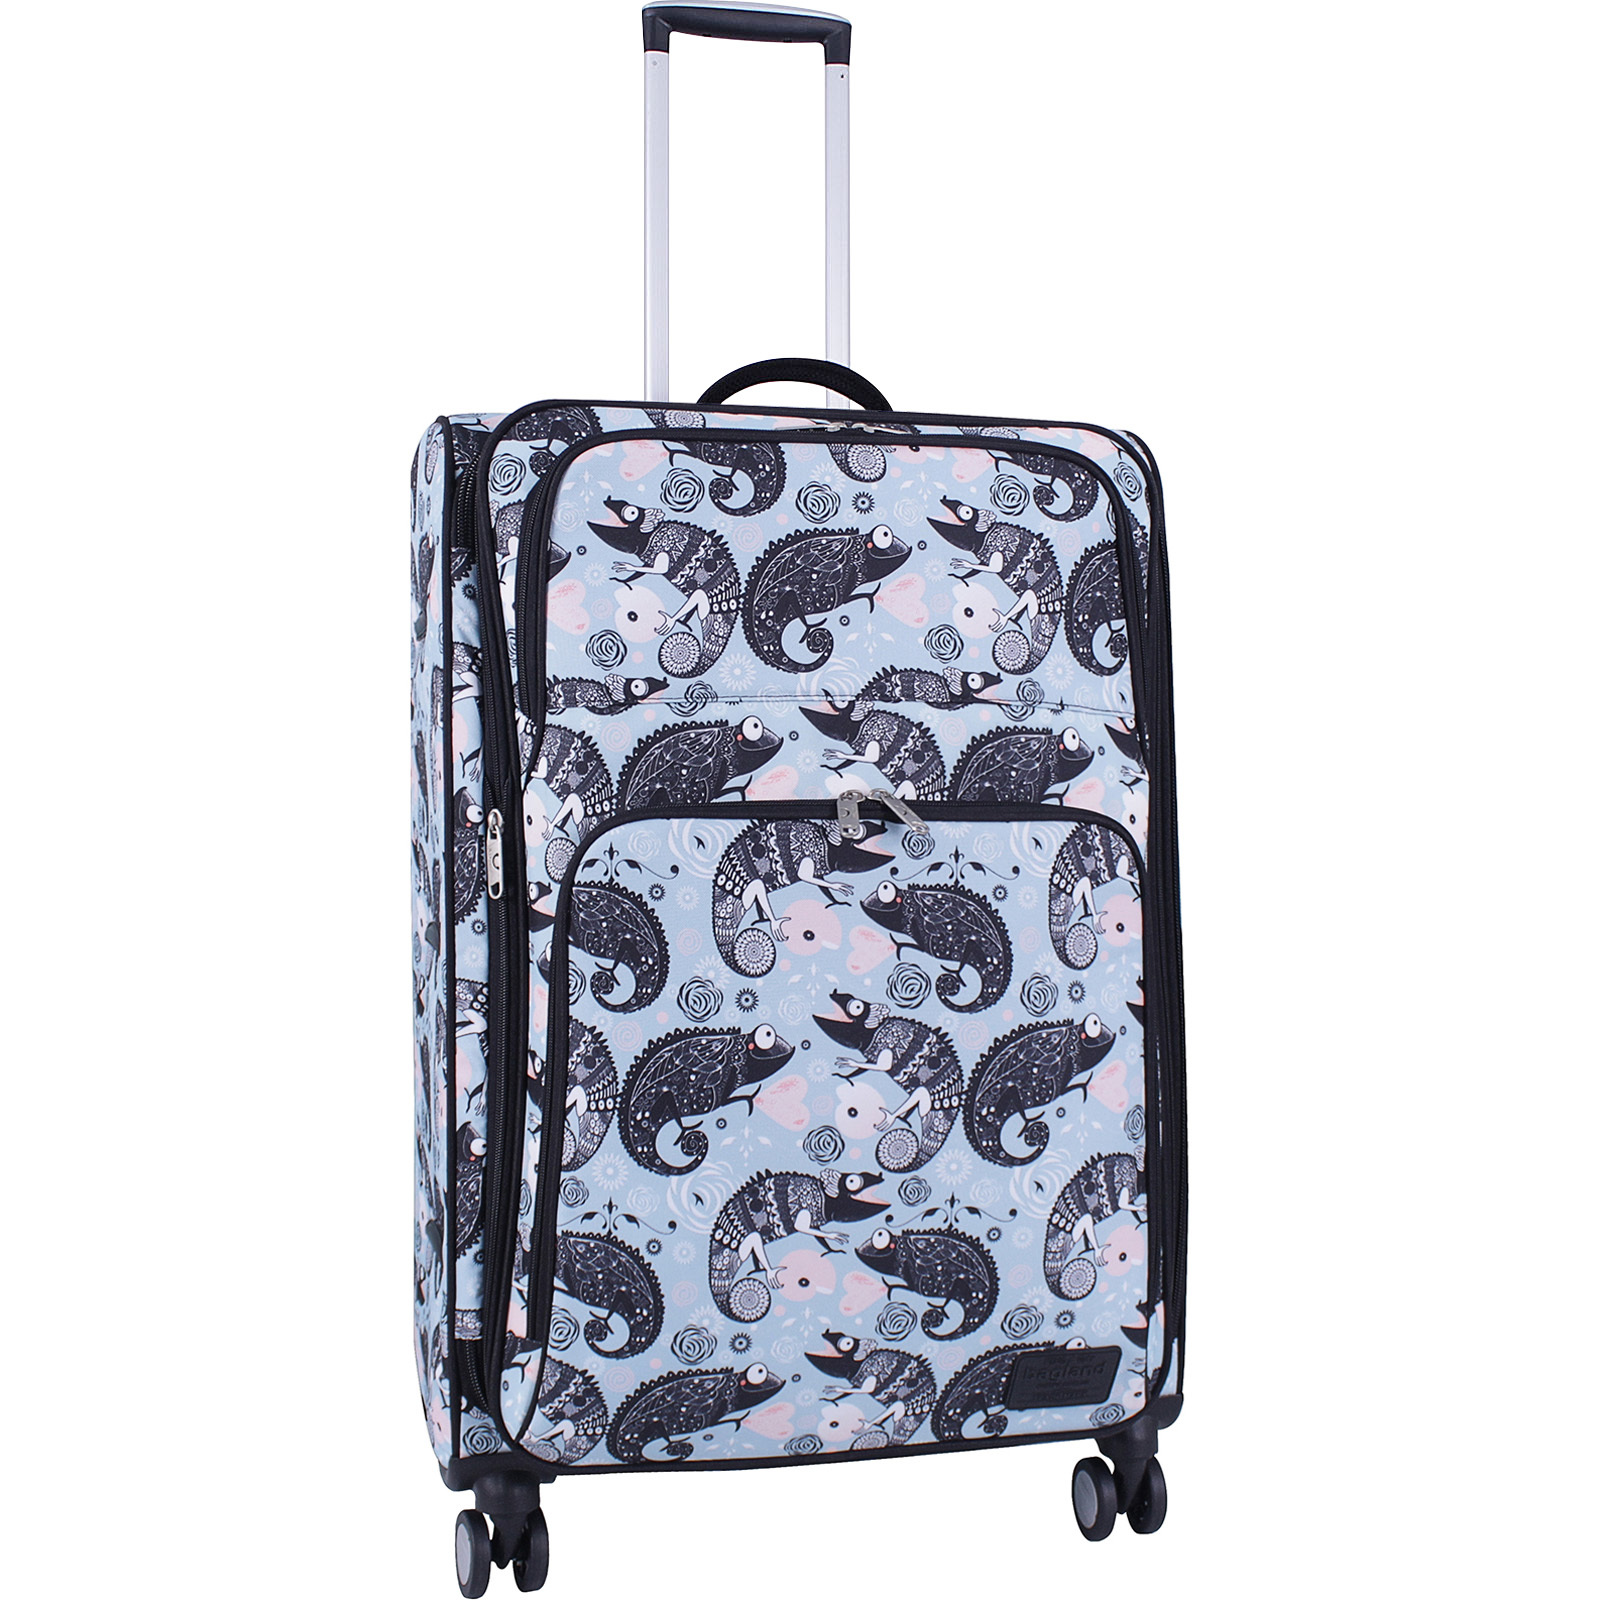 Дорожные чемоданы Чемодан Bagland Валенсия большой дизайн 83 л. сублімація 656 (0037966274) IMG_5038_суб.656_.JPG